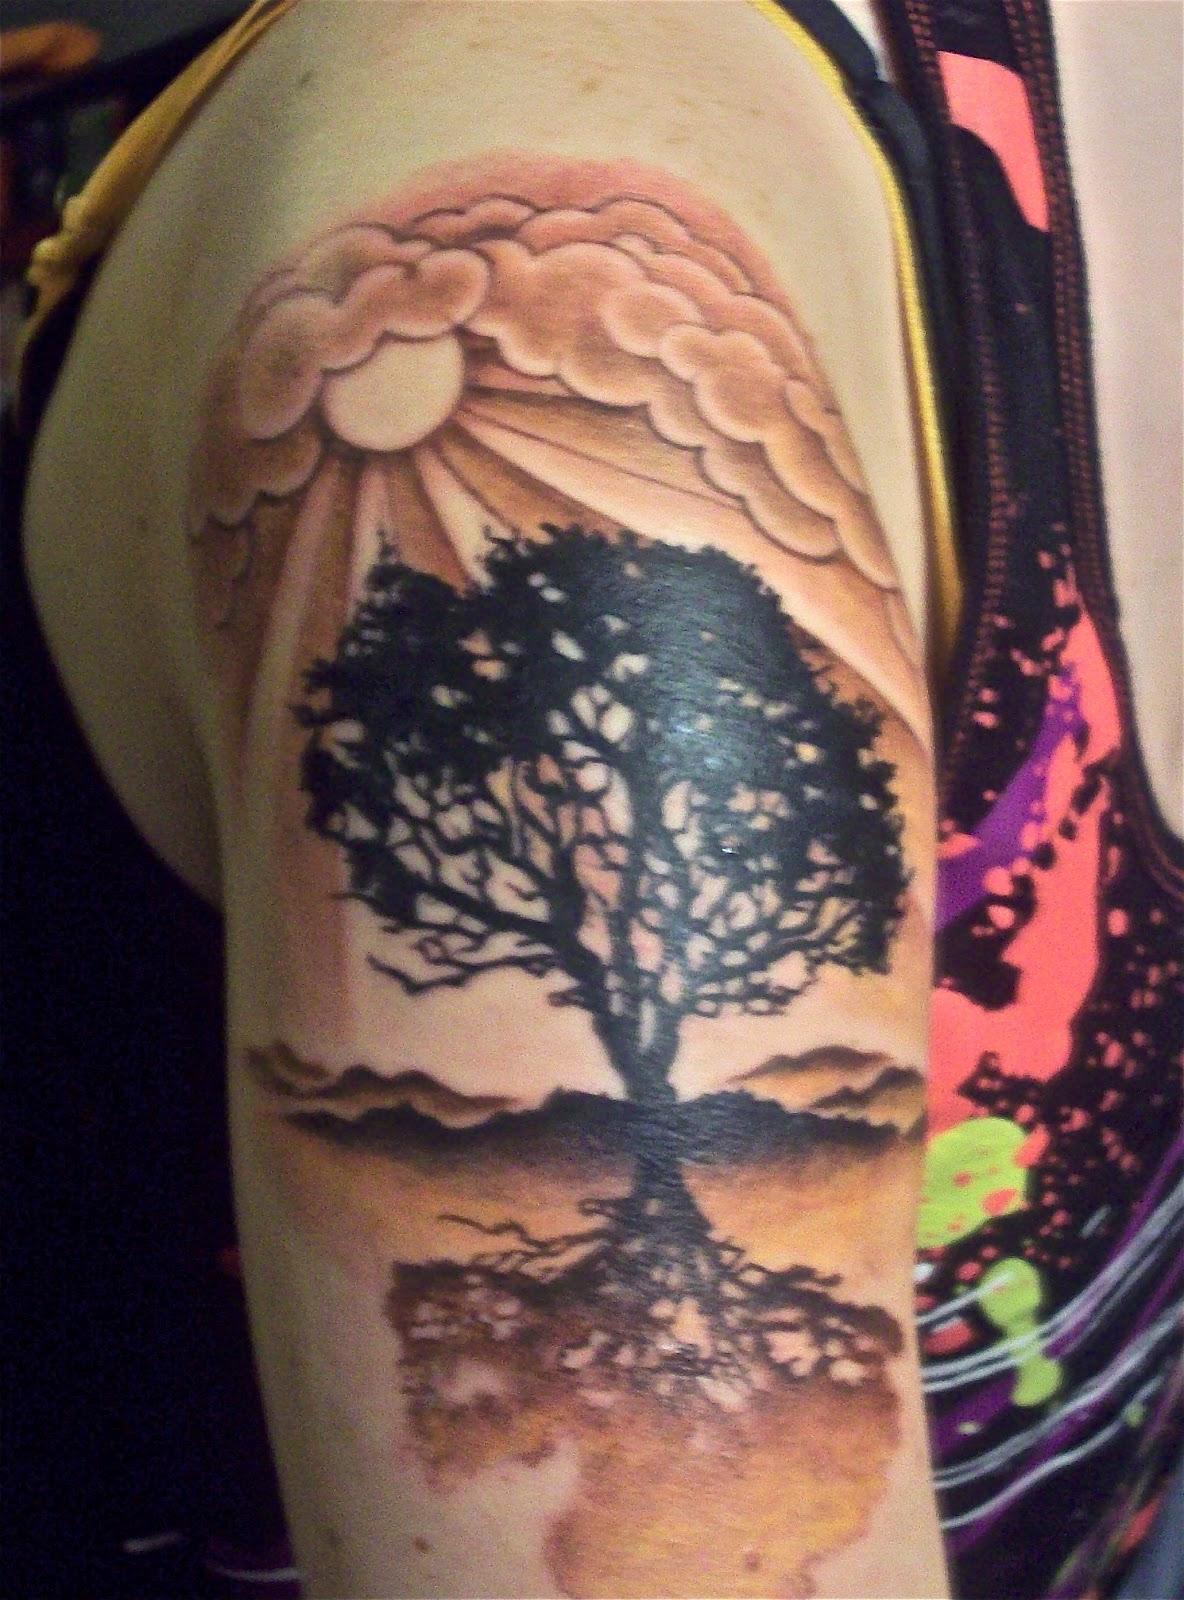 TATTOOS DESIGNS 2012: Sun Tattoos